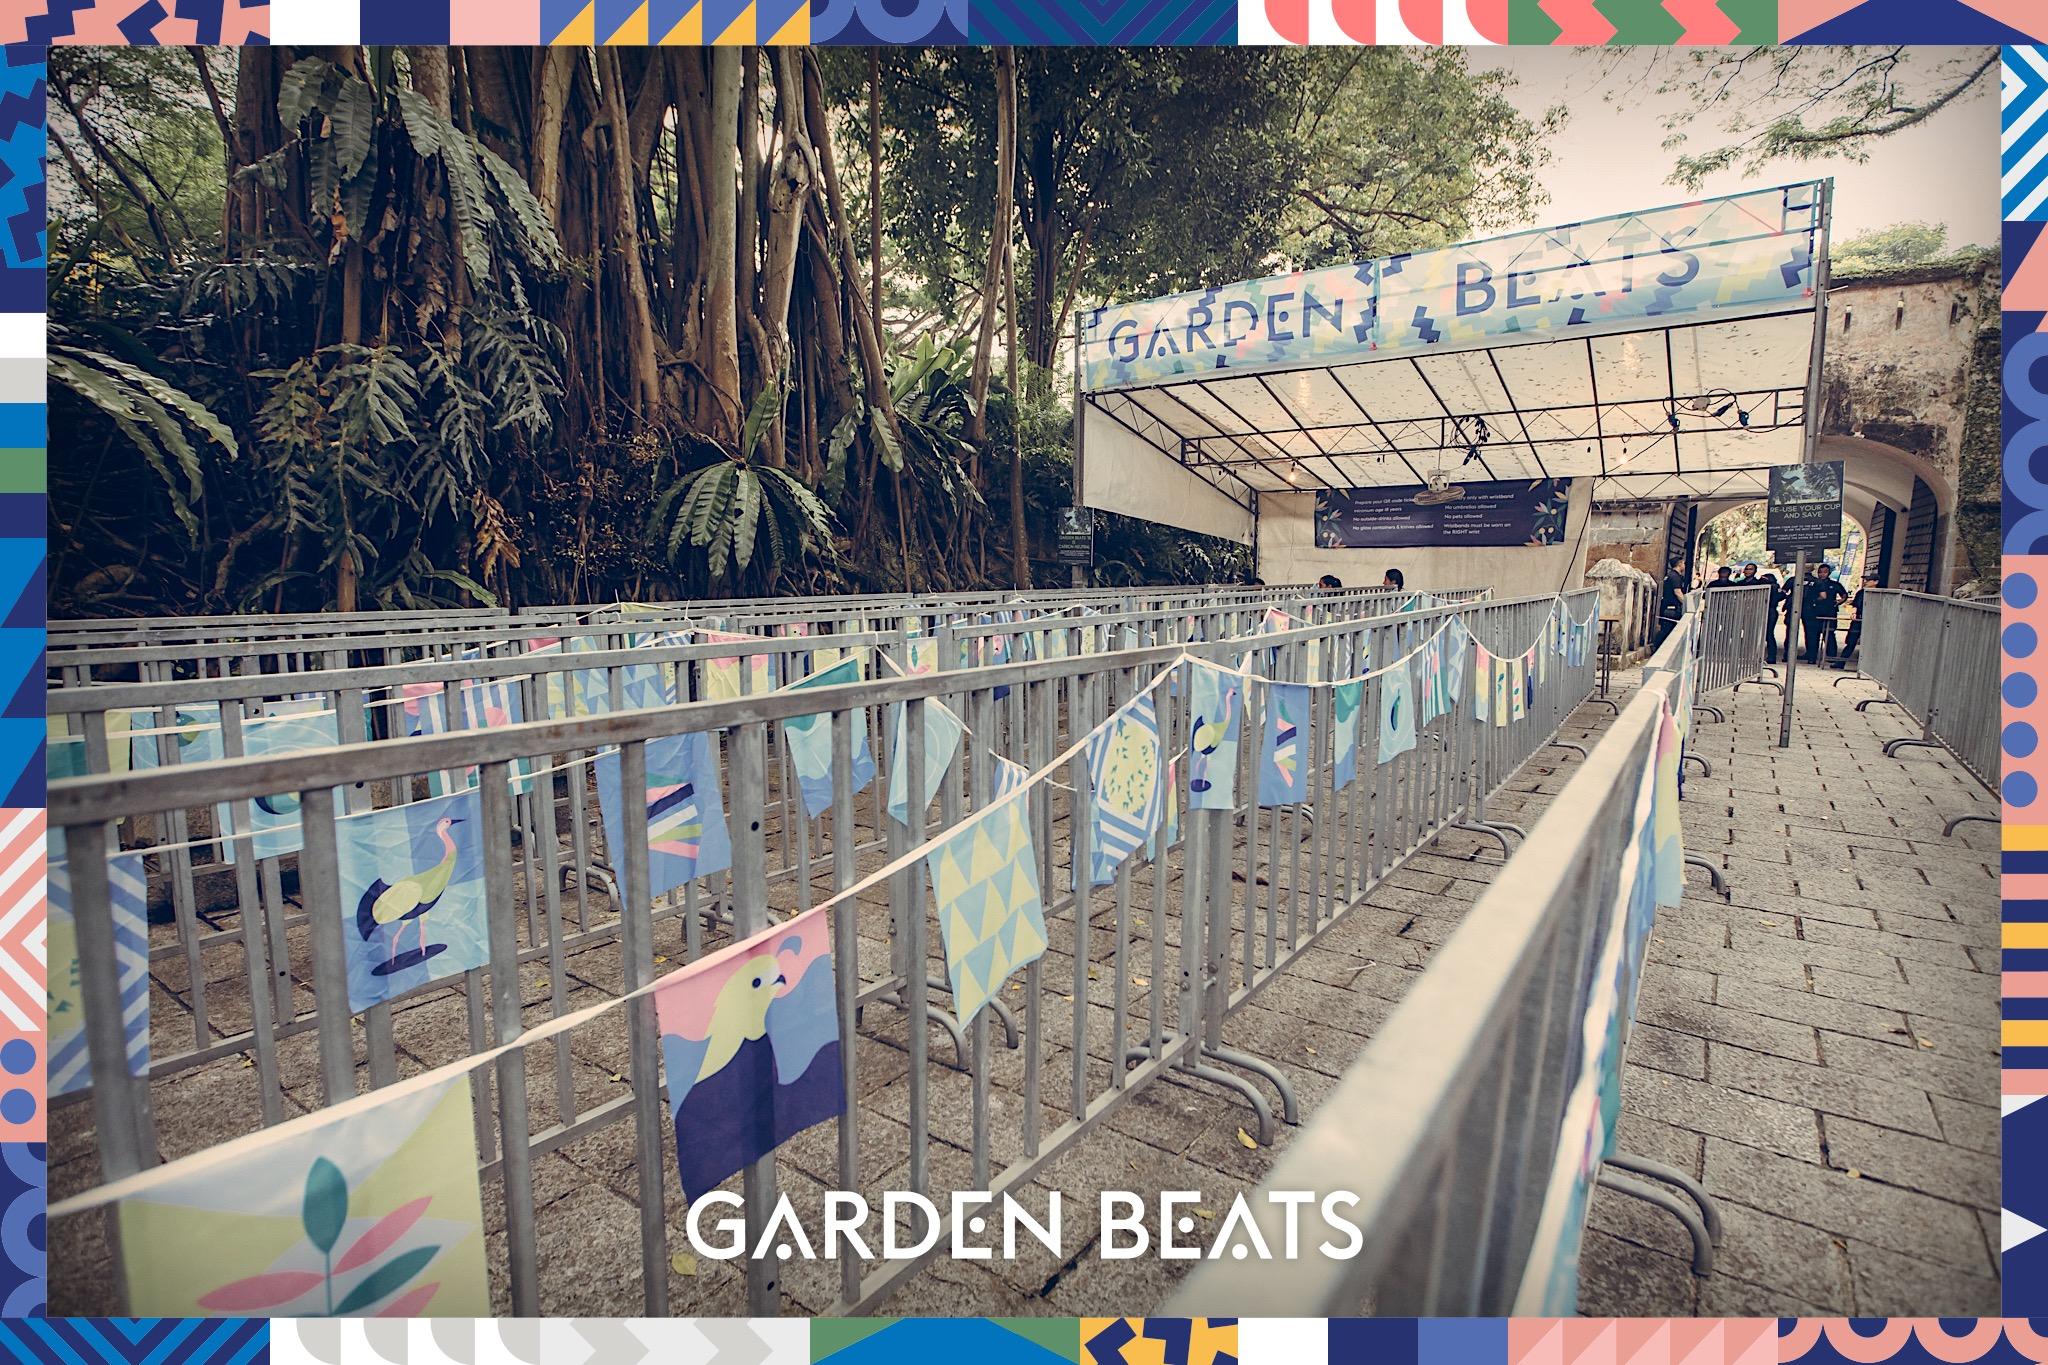 03032018_GardenBeats_Colossal015_Watermarked.jpg